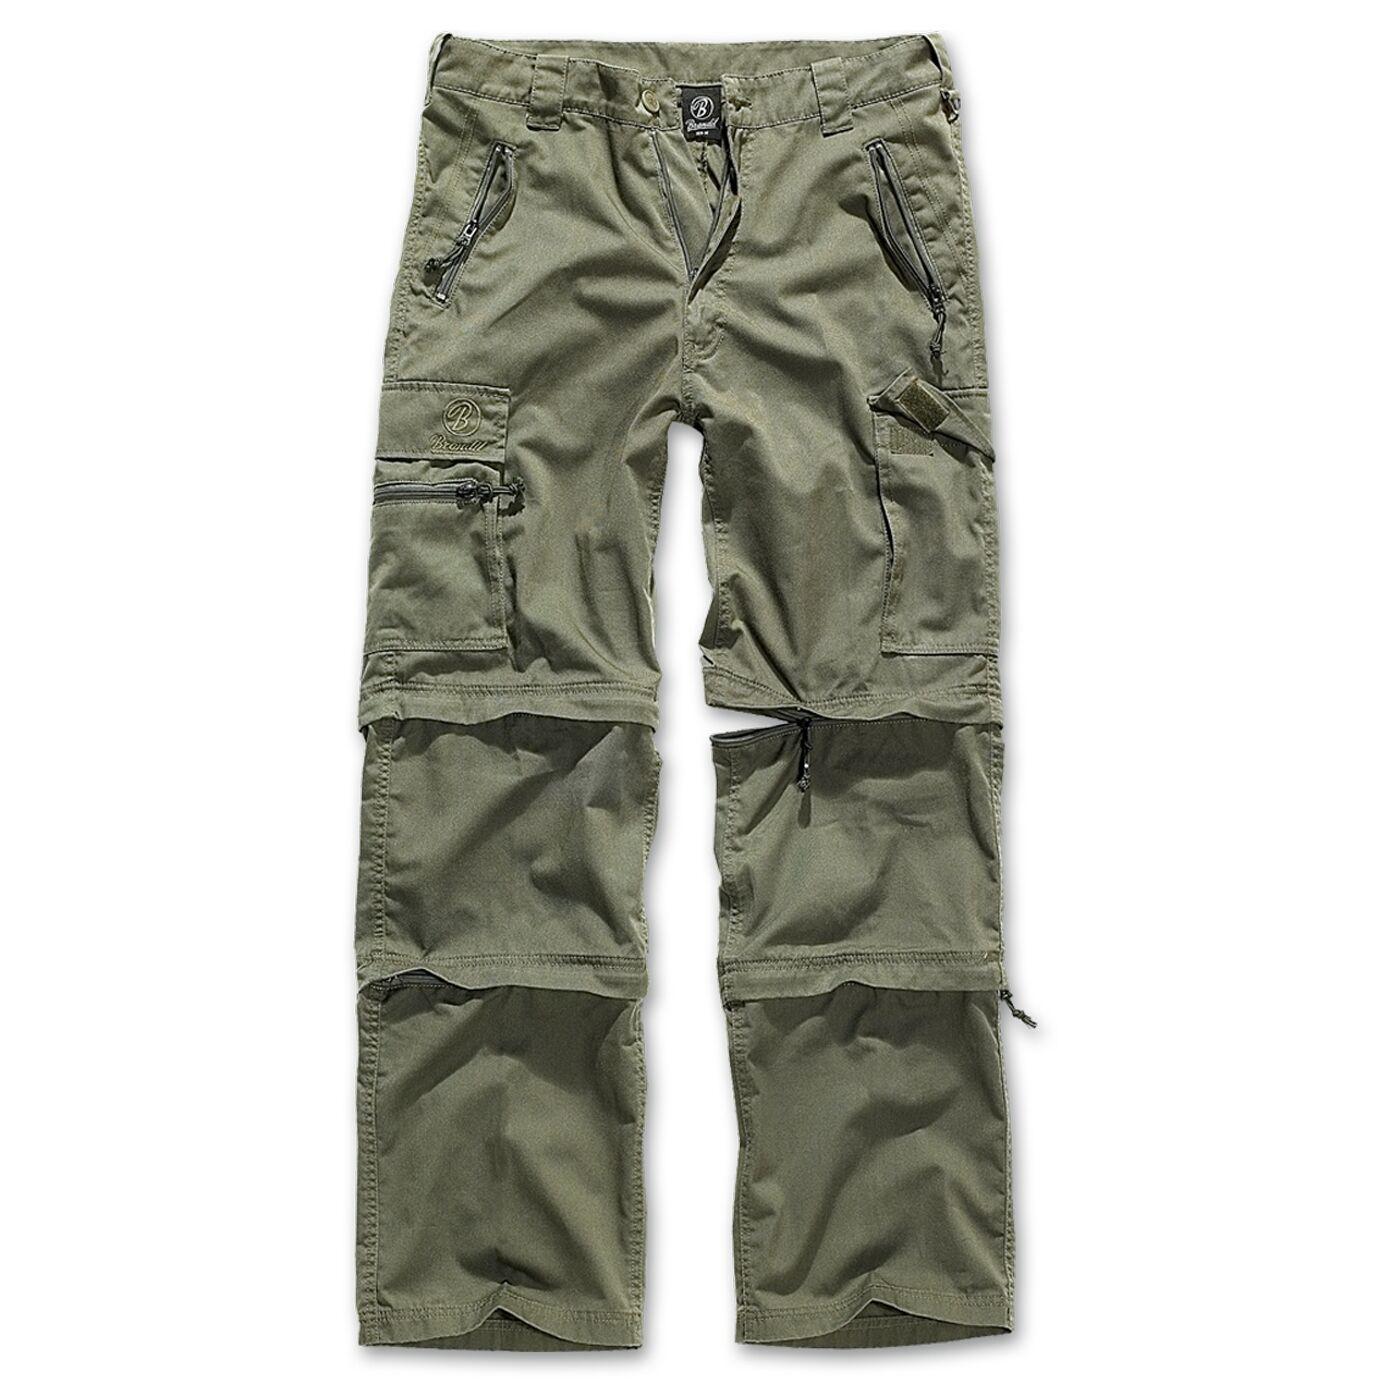 Brandit - Savanna savannahtrekking Trousers Olive Men's Cargo Trousers Trousers